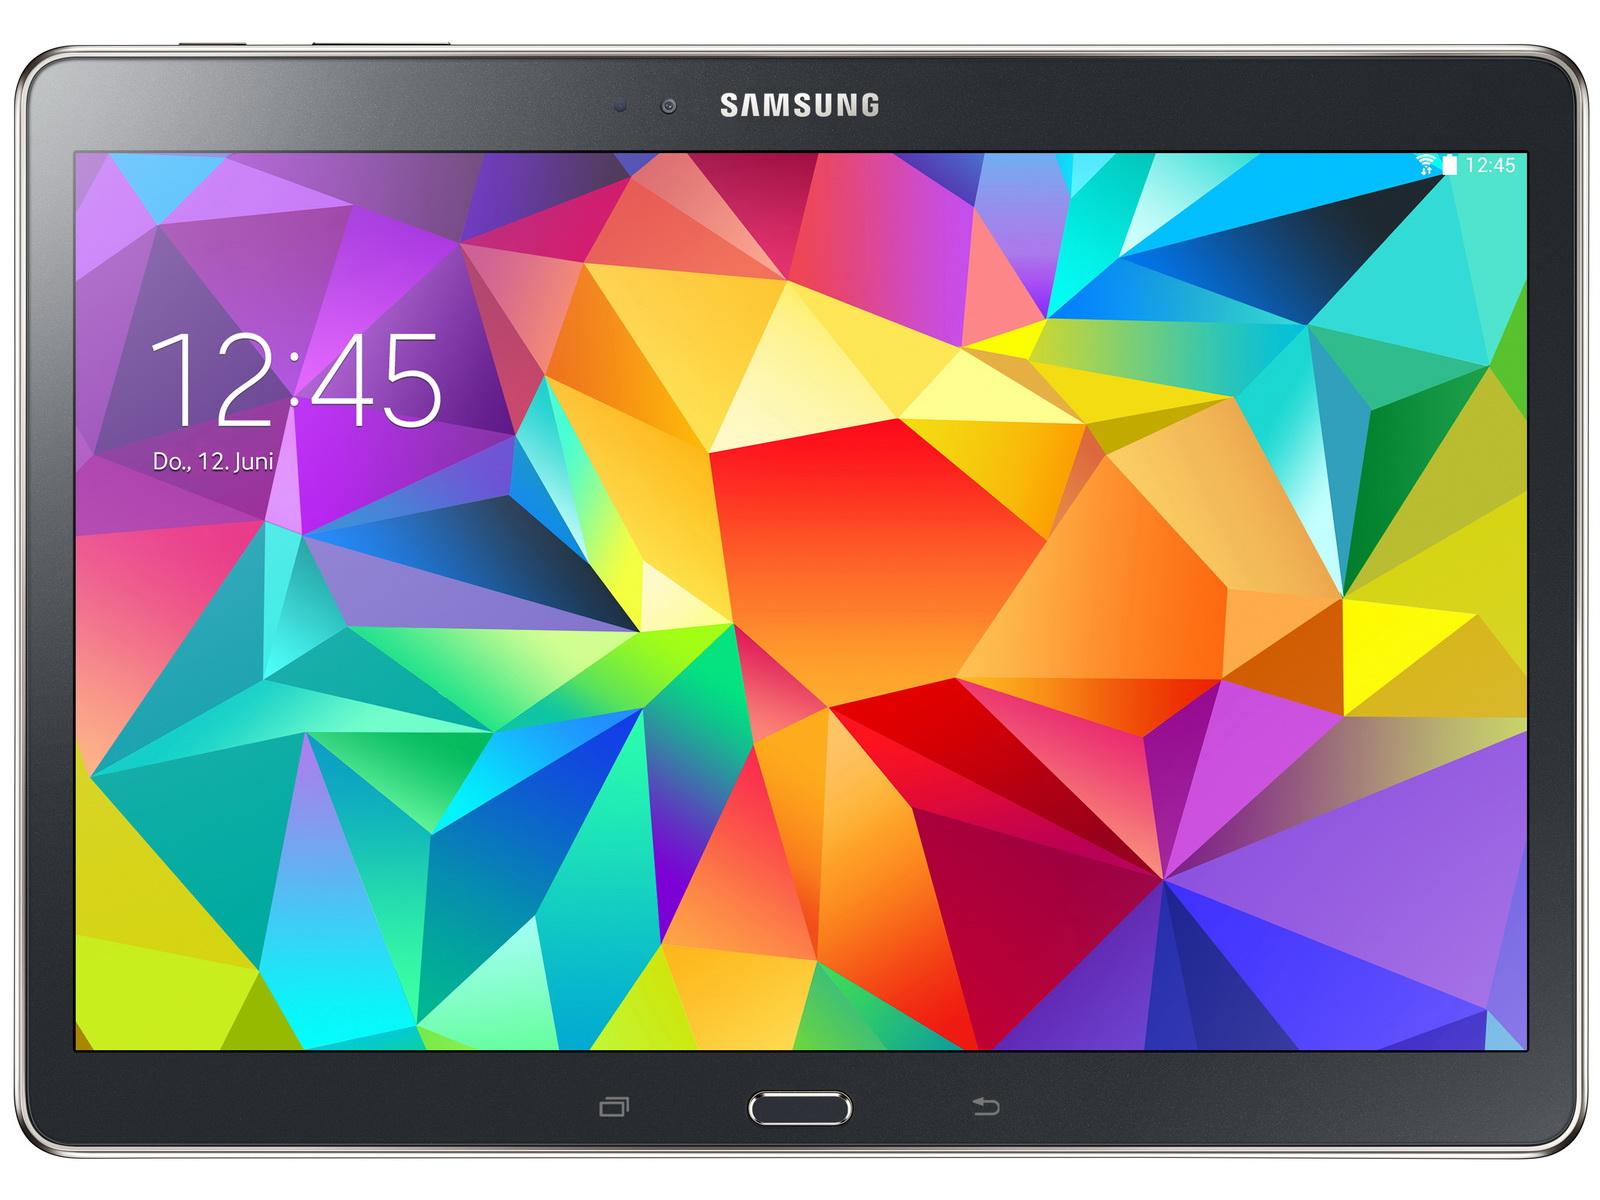 Samsung Galaxy Tab S 10.5: Tablet ab sofort auch in Schwarz -  Notebookcheck.com News